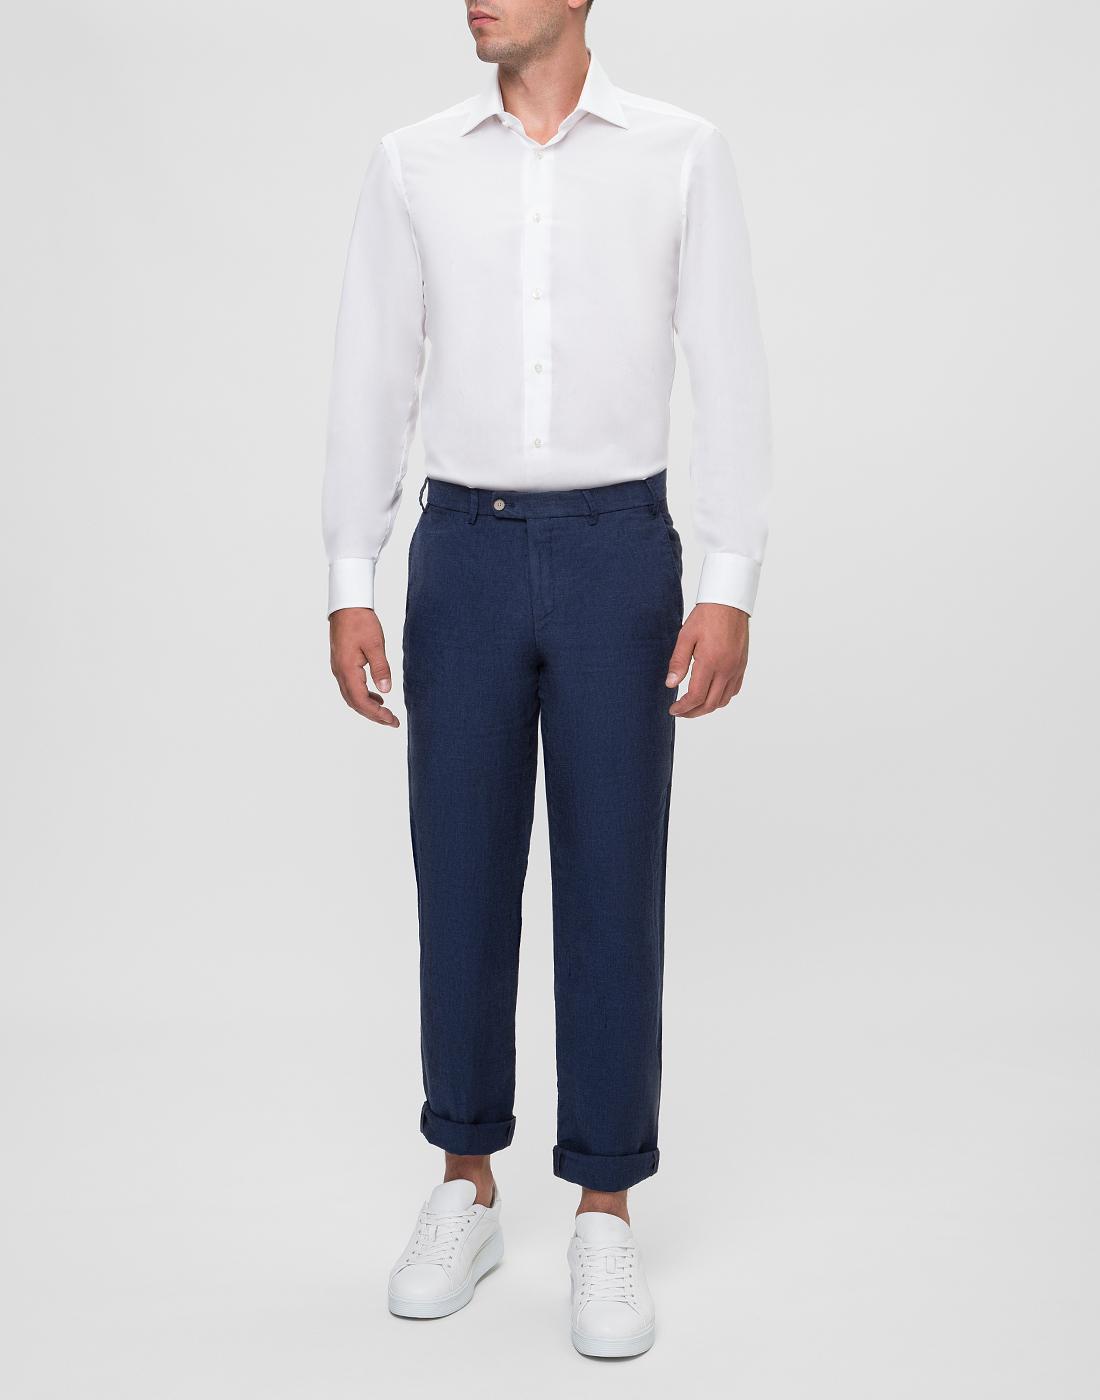 Мужская белая рубашка Barba SD2U634540301U-5